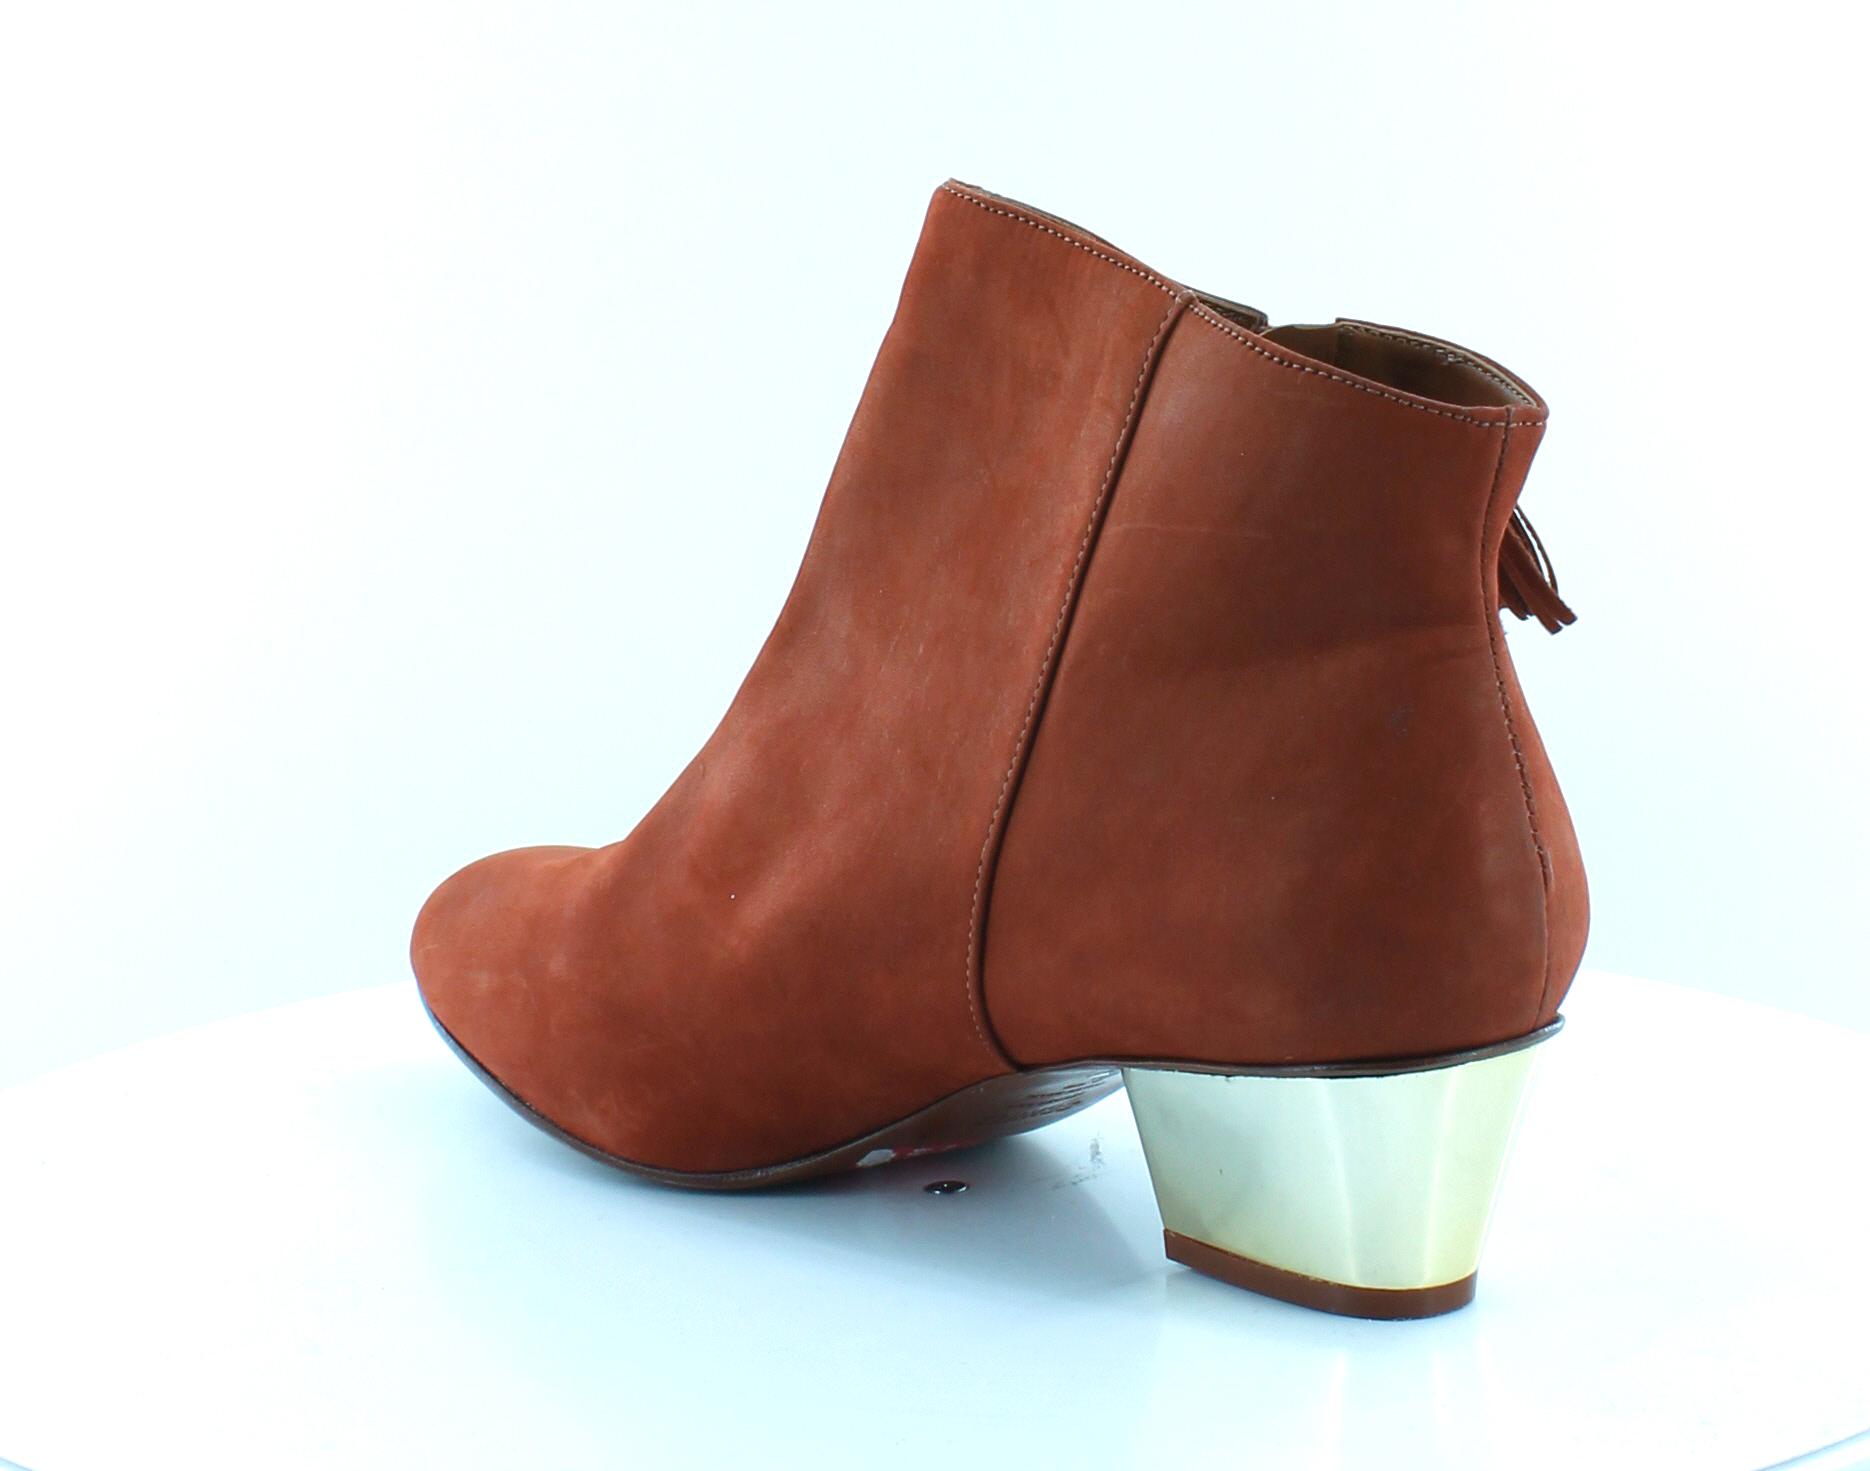 pierazzoli gomme arezzo shoes - photo#24